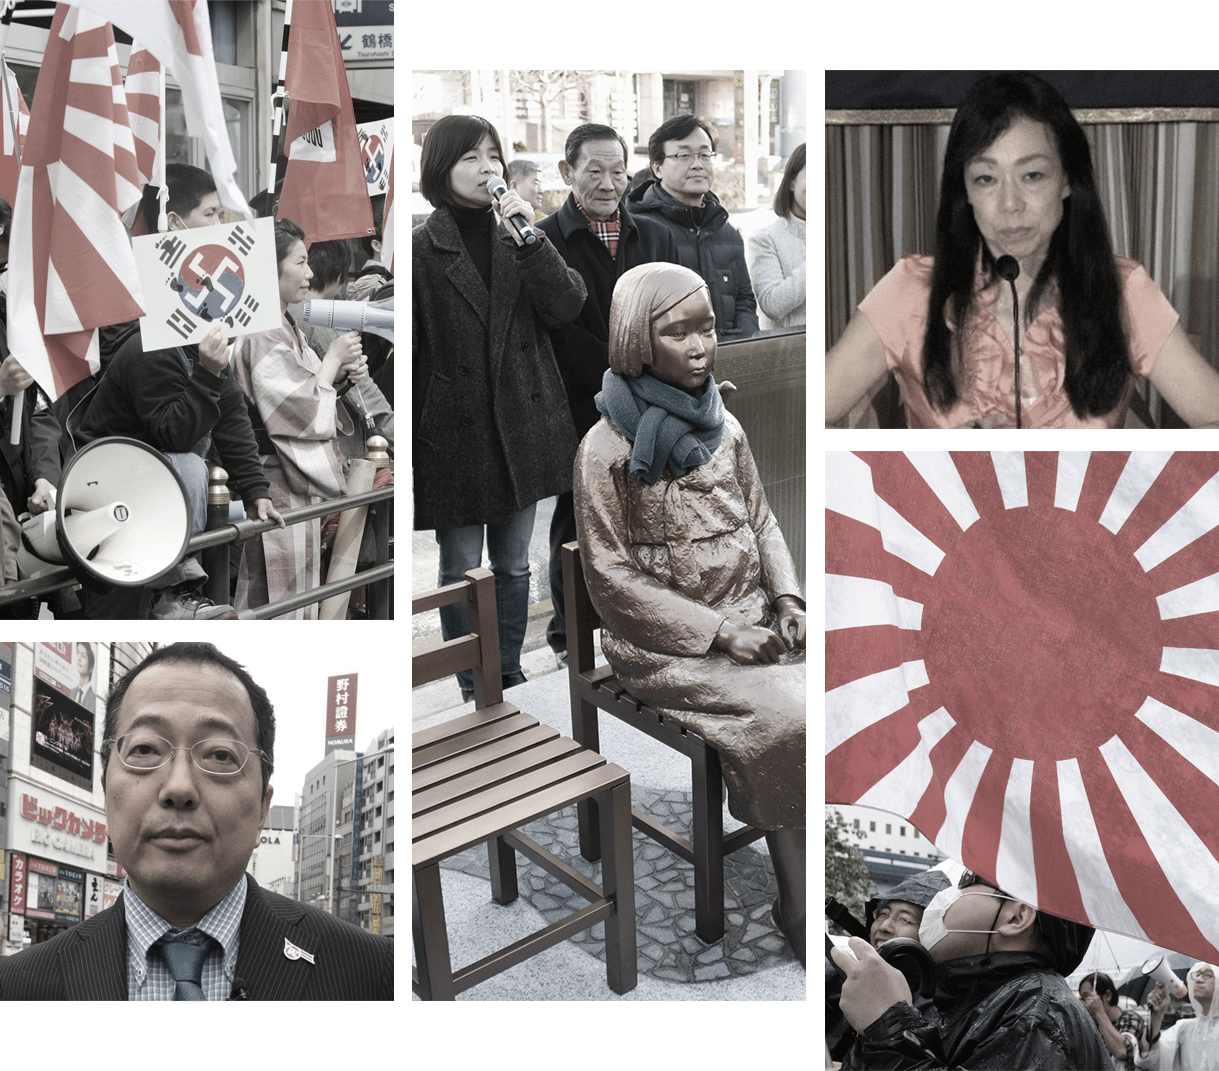 Left: Tetsuhide Yamaoka (Photo: ABC News), below Zaitokukai protesters in Osaka, Japan (Photo: Kyodo News).Centre: The comfort women statue near the Japanese consulate in Busan, South Korea (Photo: Kyodo News).Right: Yumiko Yamamoto (Photo: YouTube) above Zaitokukai protesters in Osaka, Japan (Photo: Kyodo News)